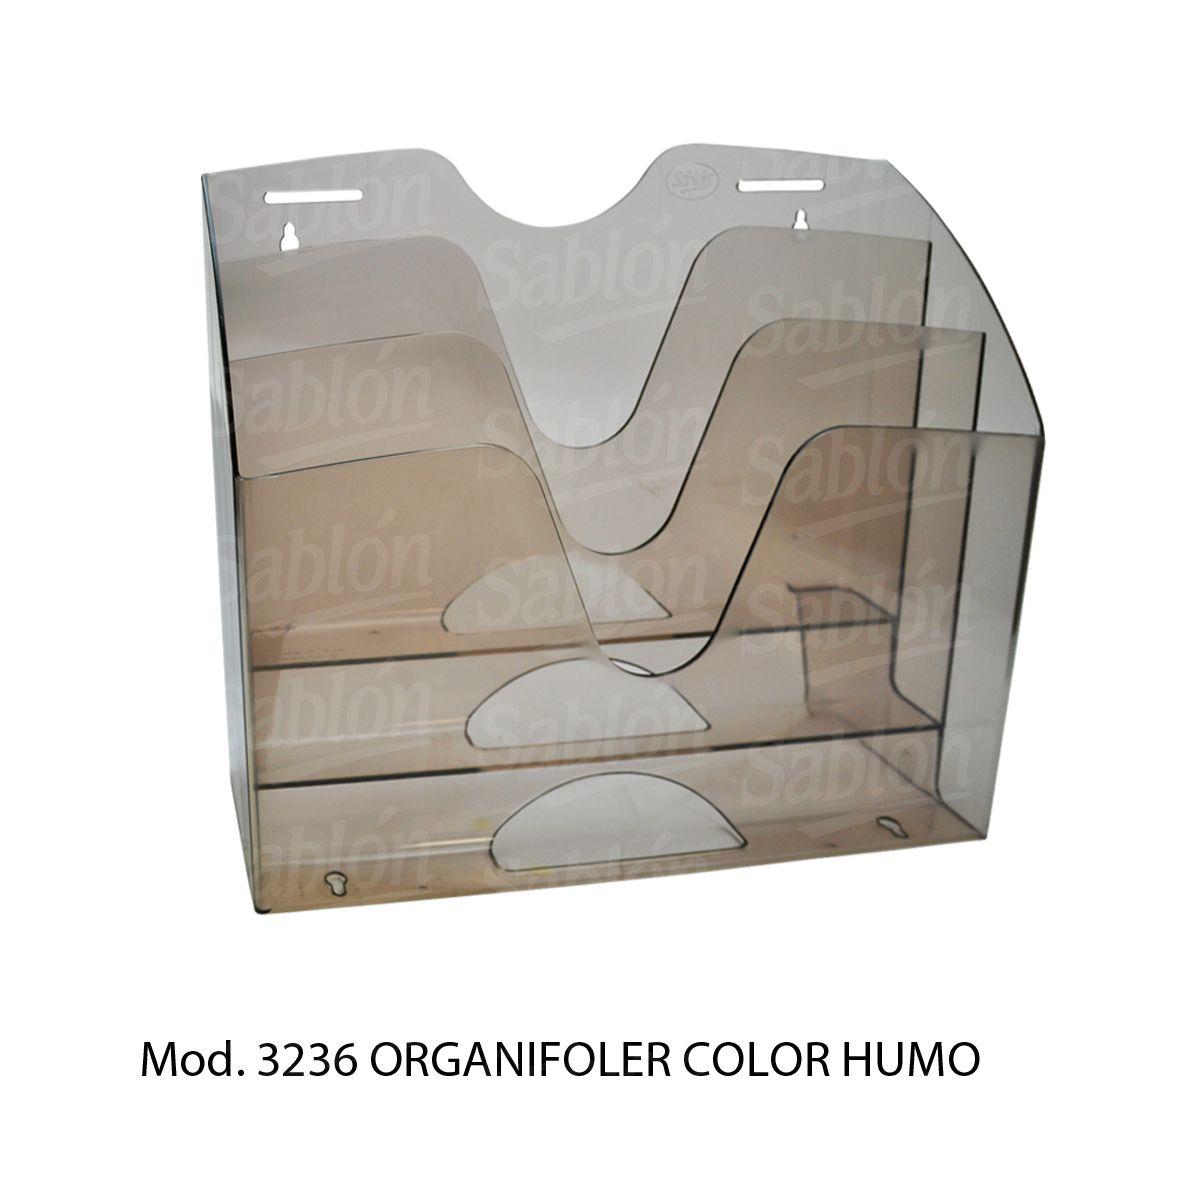 Organifolder humo organizacion de documentos mod 3236 for Articulos de oficina